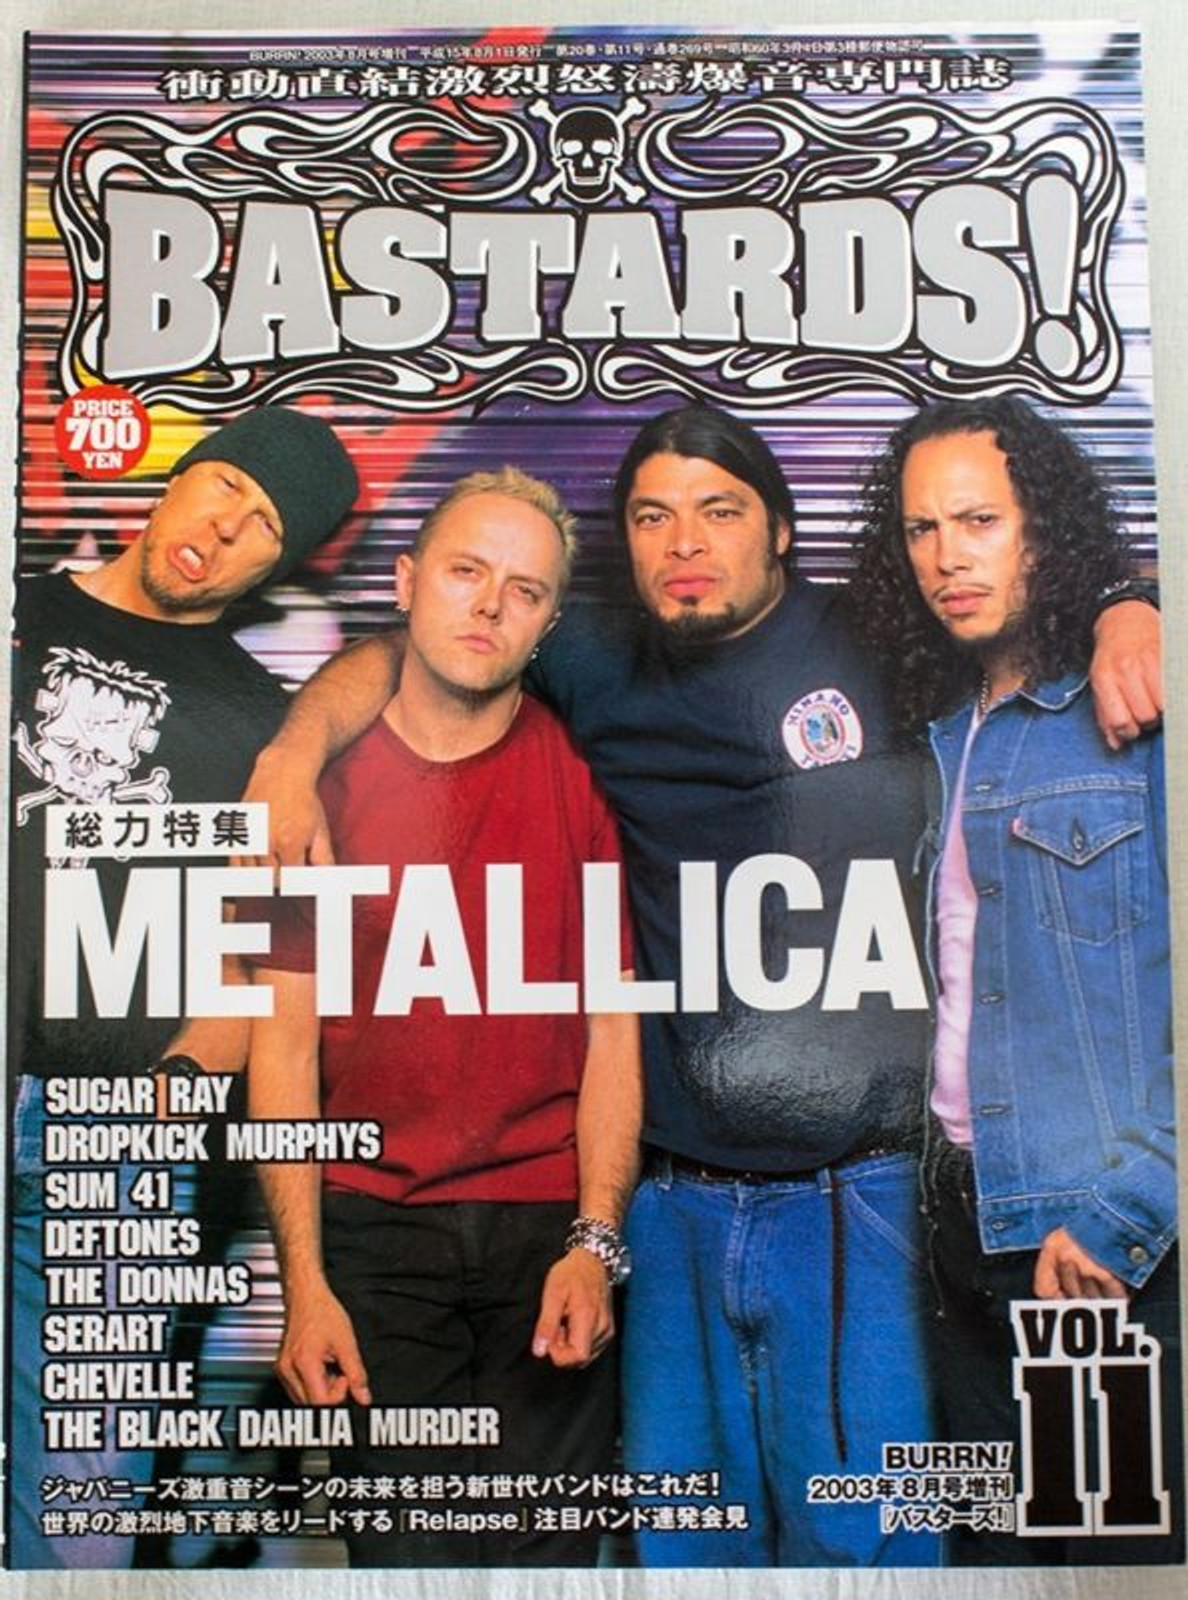 2003 Vol.11 BASTARDS! BURRN! Japan Magazine METALLICA/THE DONNAS/BOB LOG 3/SUM41